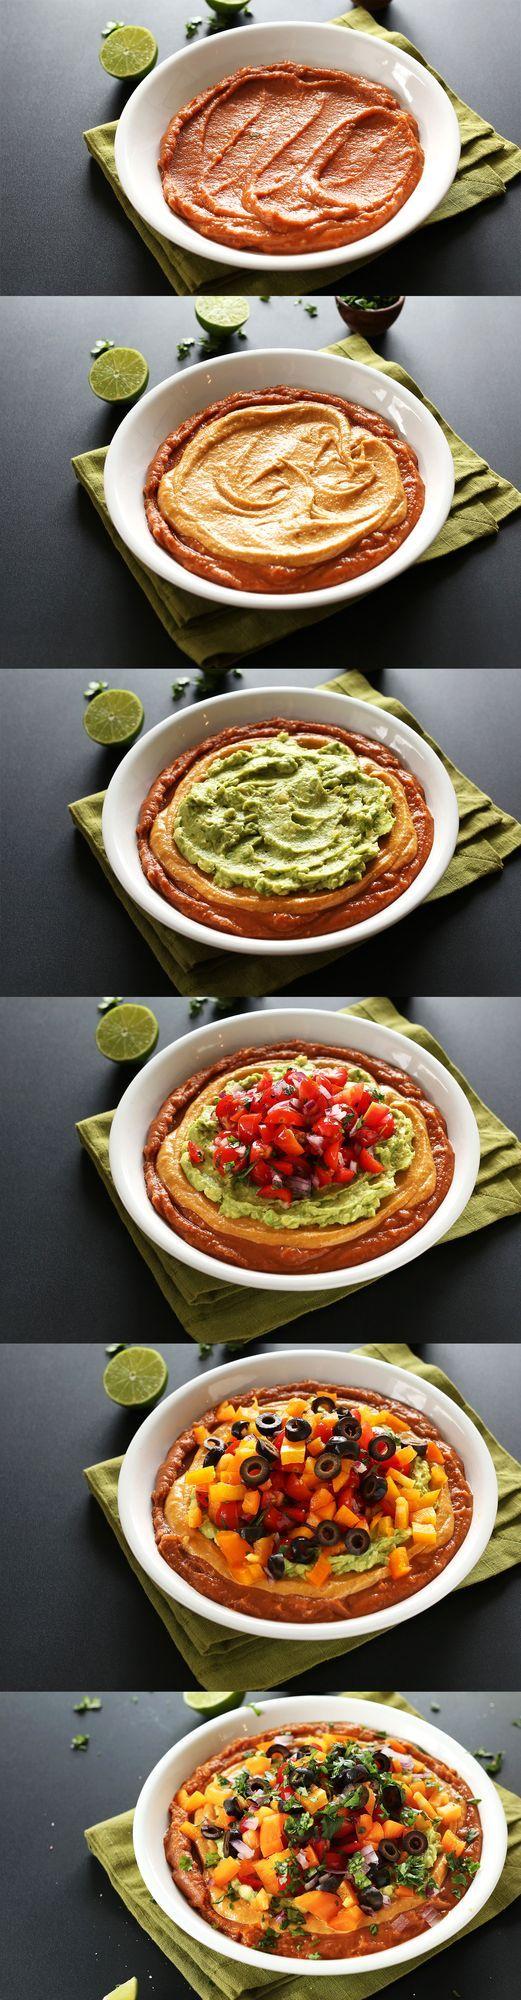 Vegan 7 Layer Mexican Dip (via Bloglovin.com )